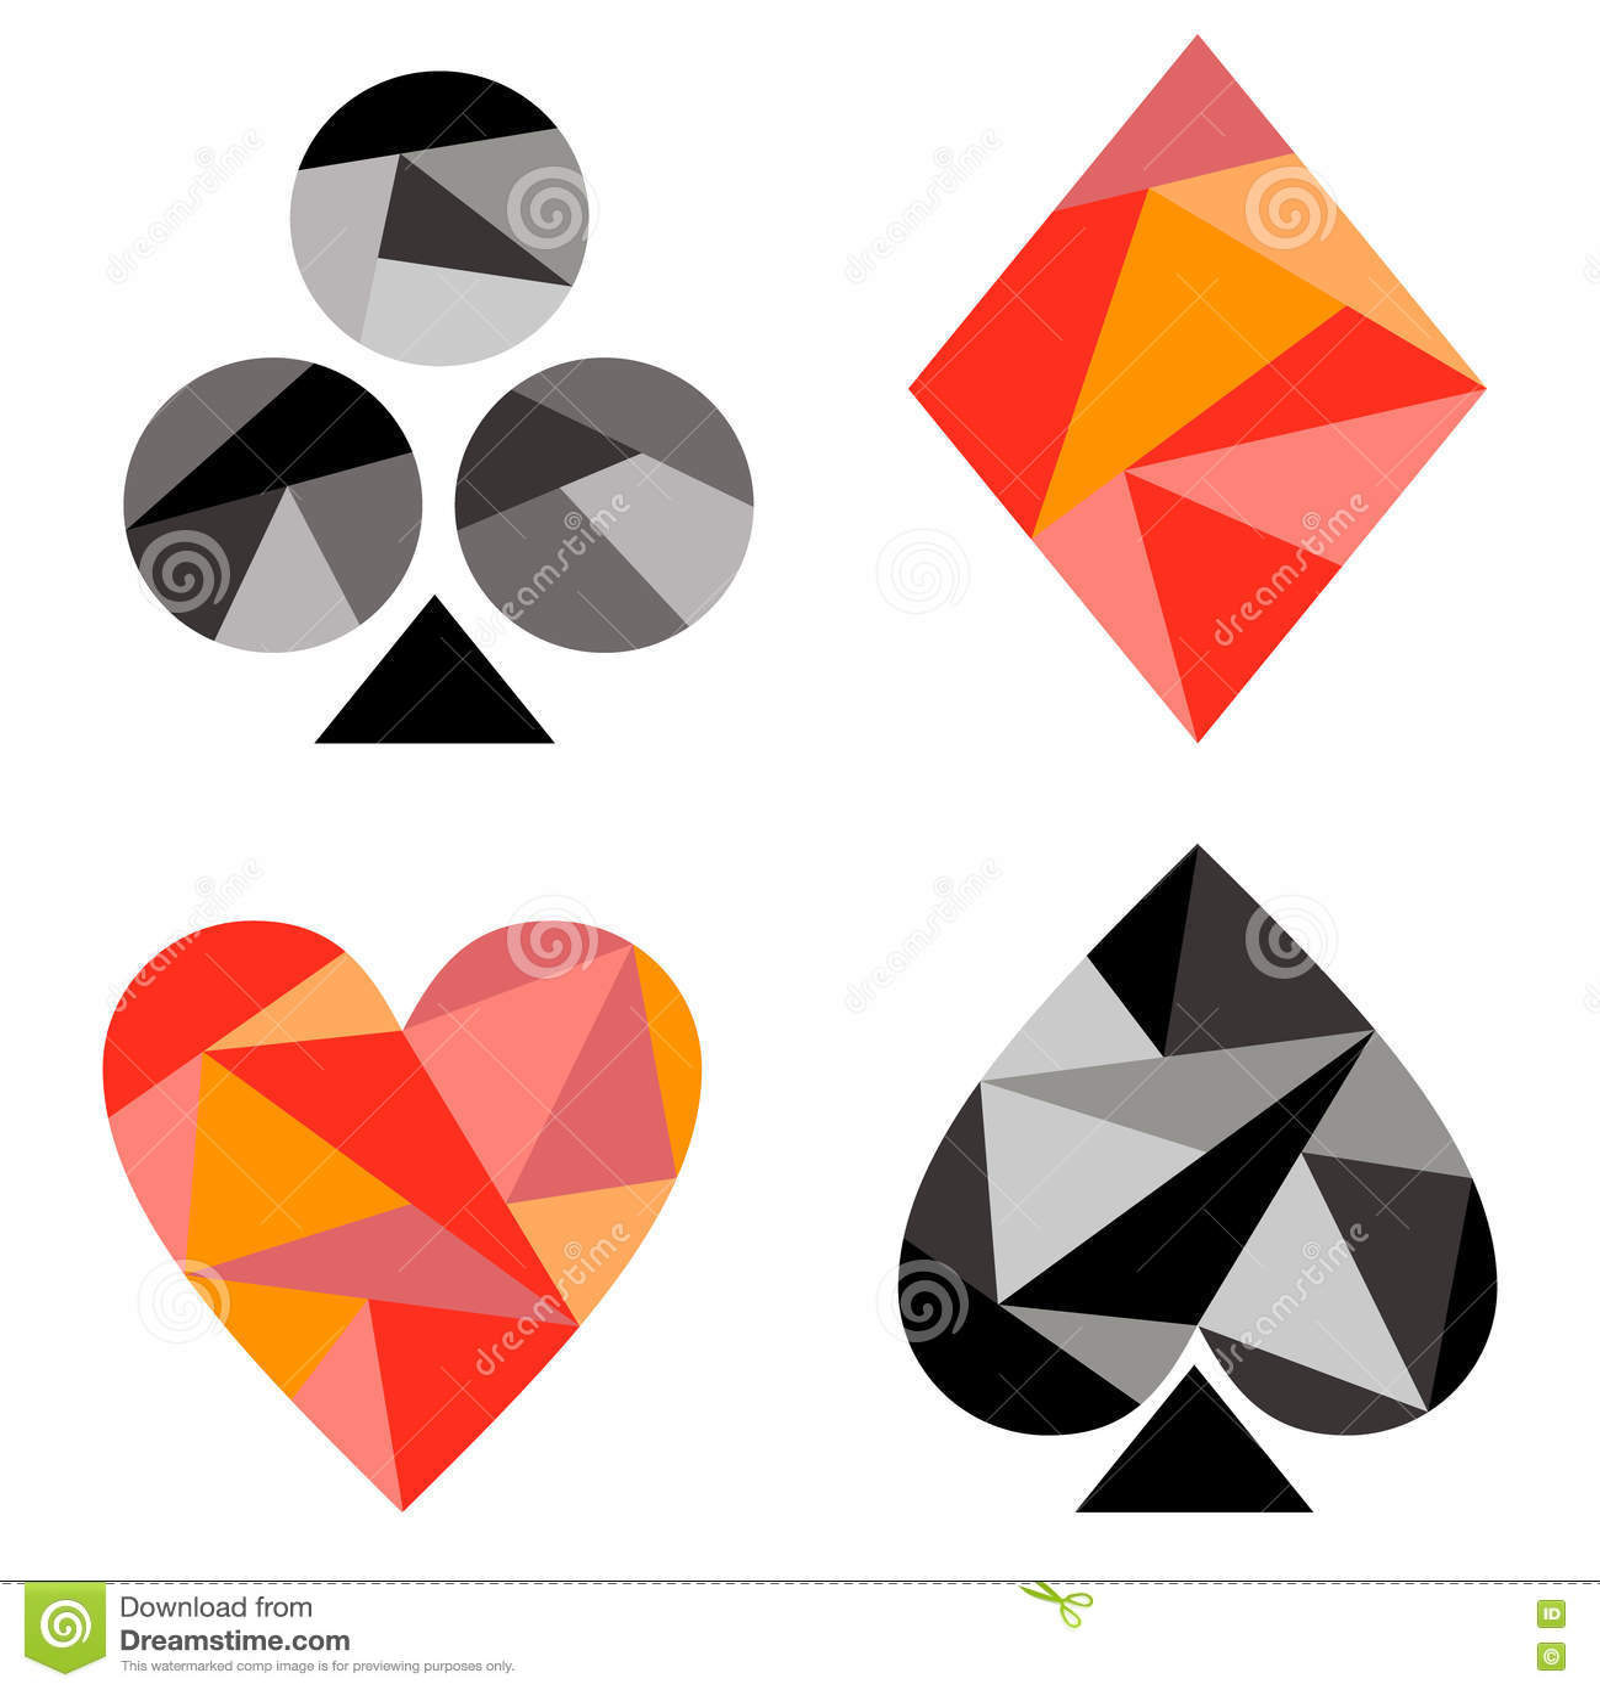 Vector set of playing card symbols black and red icons isolated vector set of playing card symbols black and red icons isolated on the backgrounds biocorpaavc